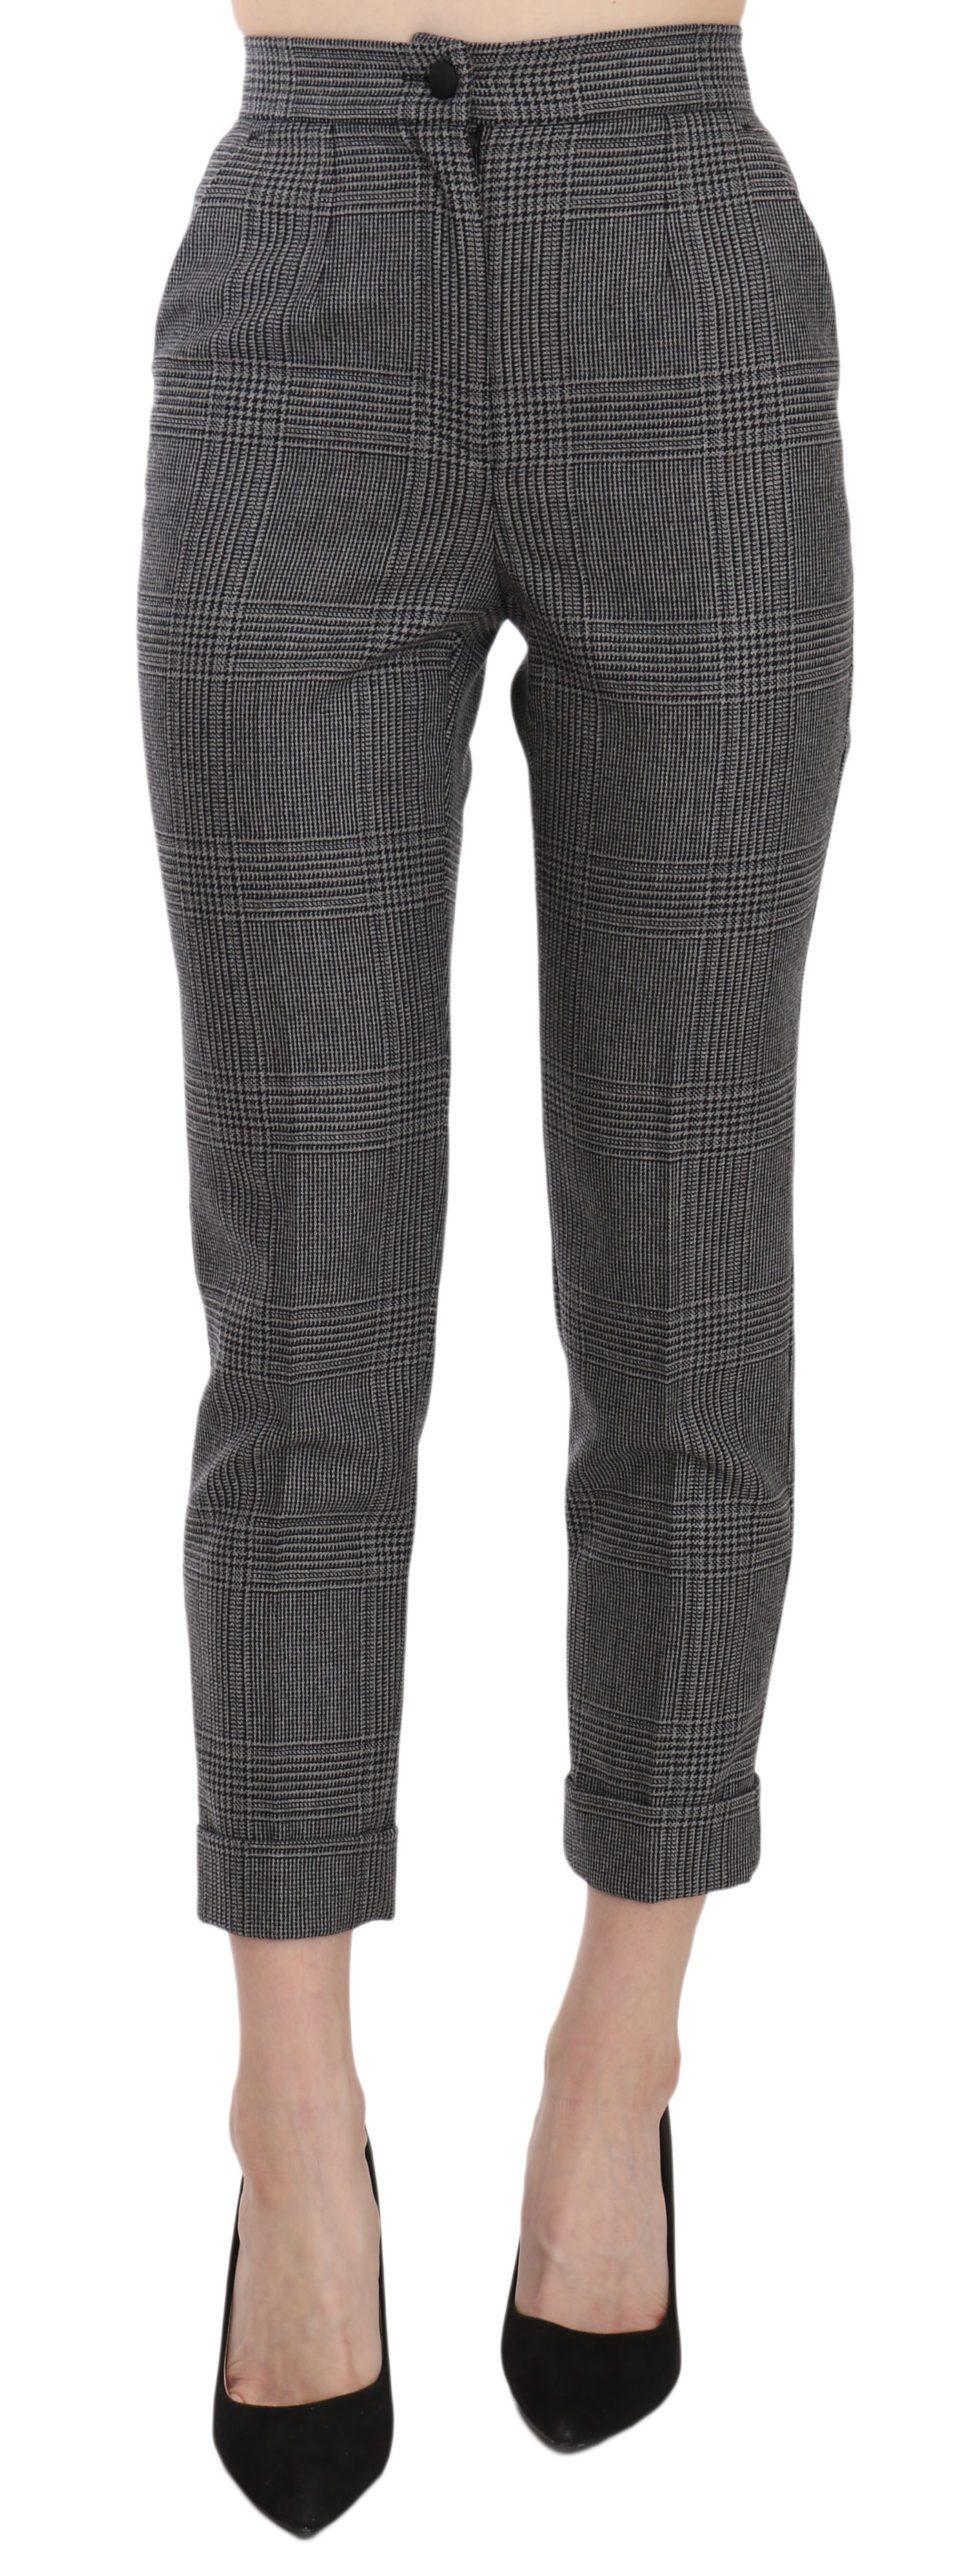 Dolce & Gabbana Women's Plaid High Waist Cropped Skinny Trouser Gray Pan70070 - IT36   XS